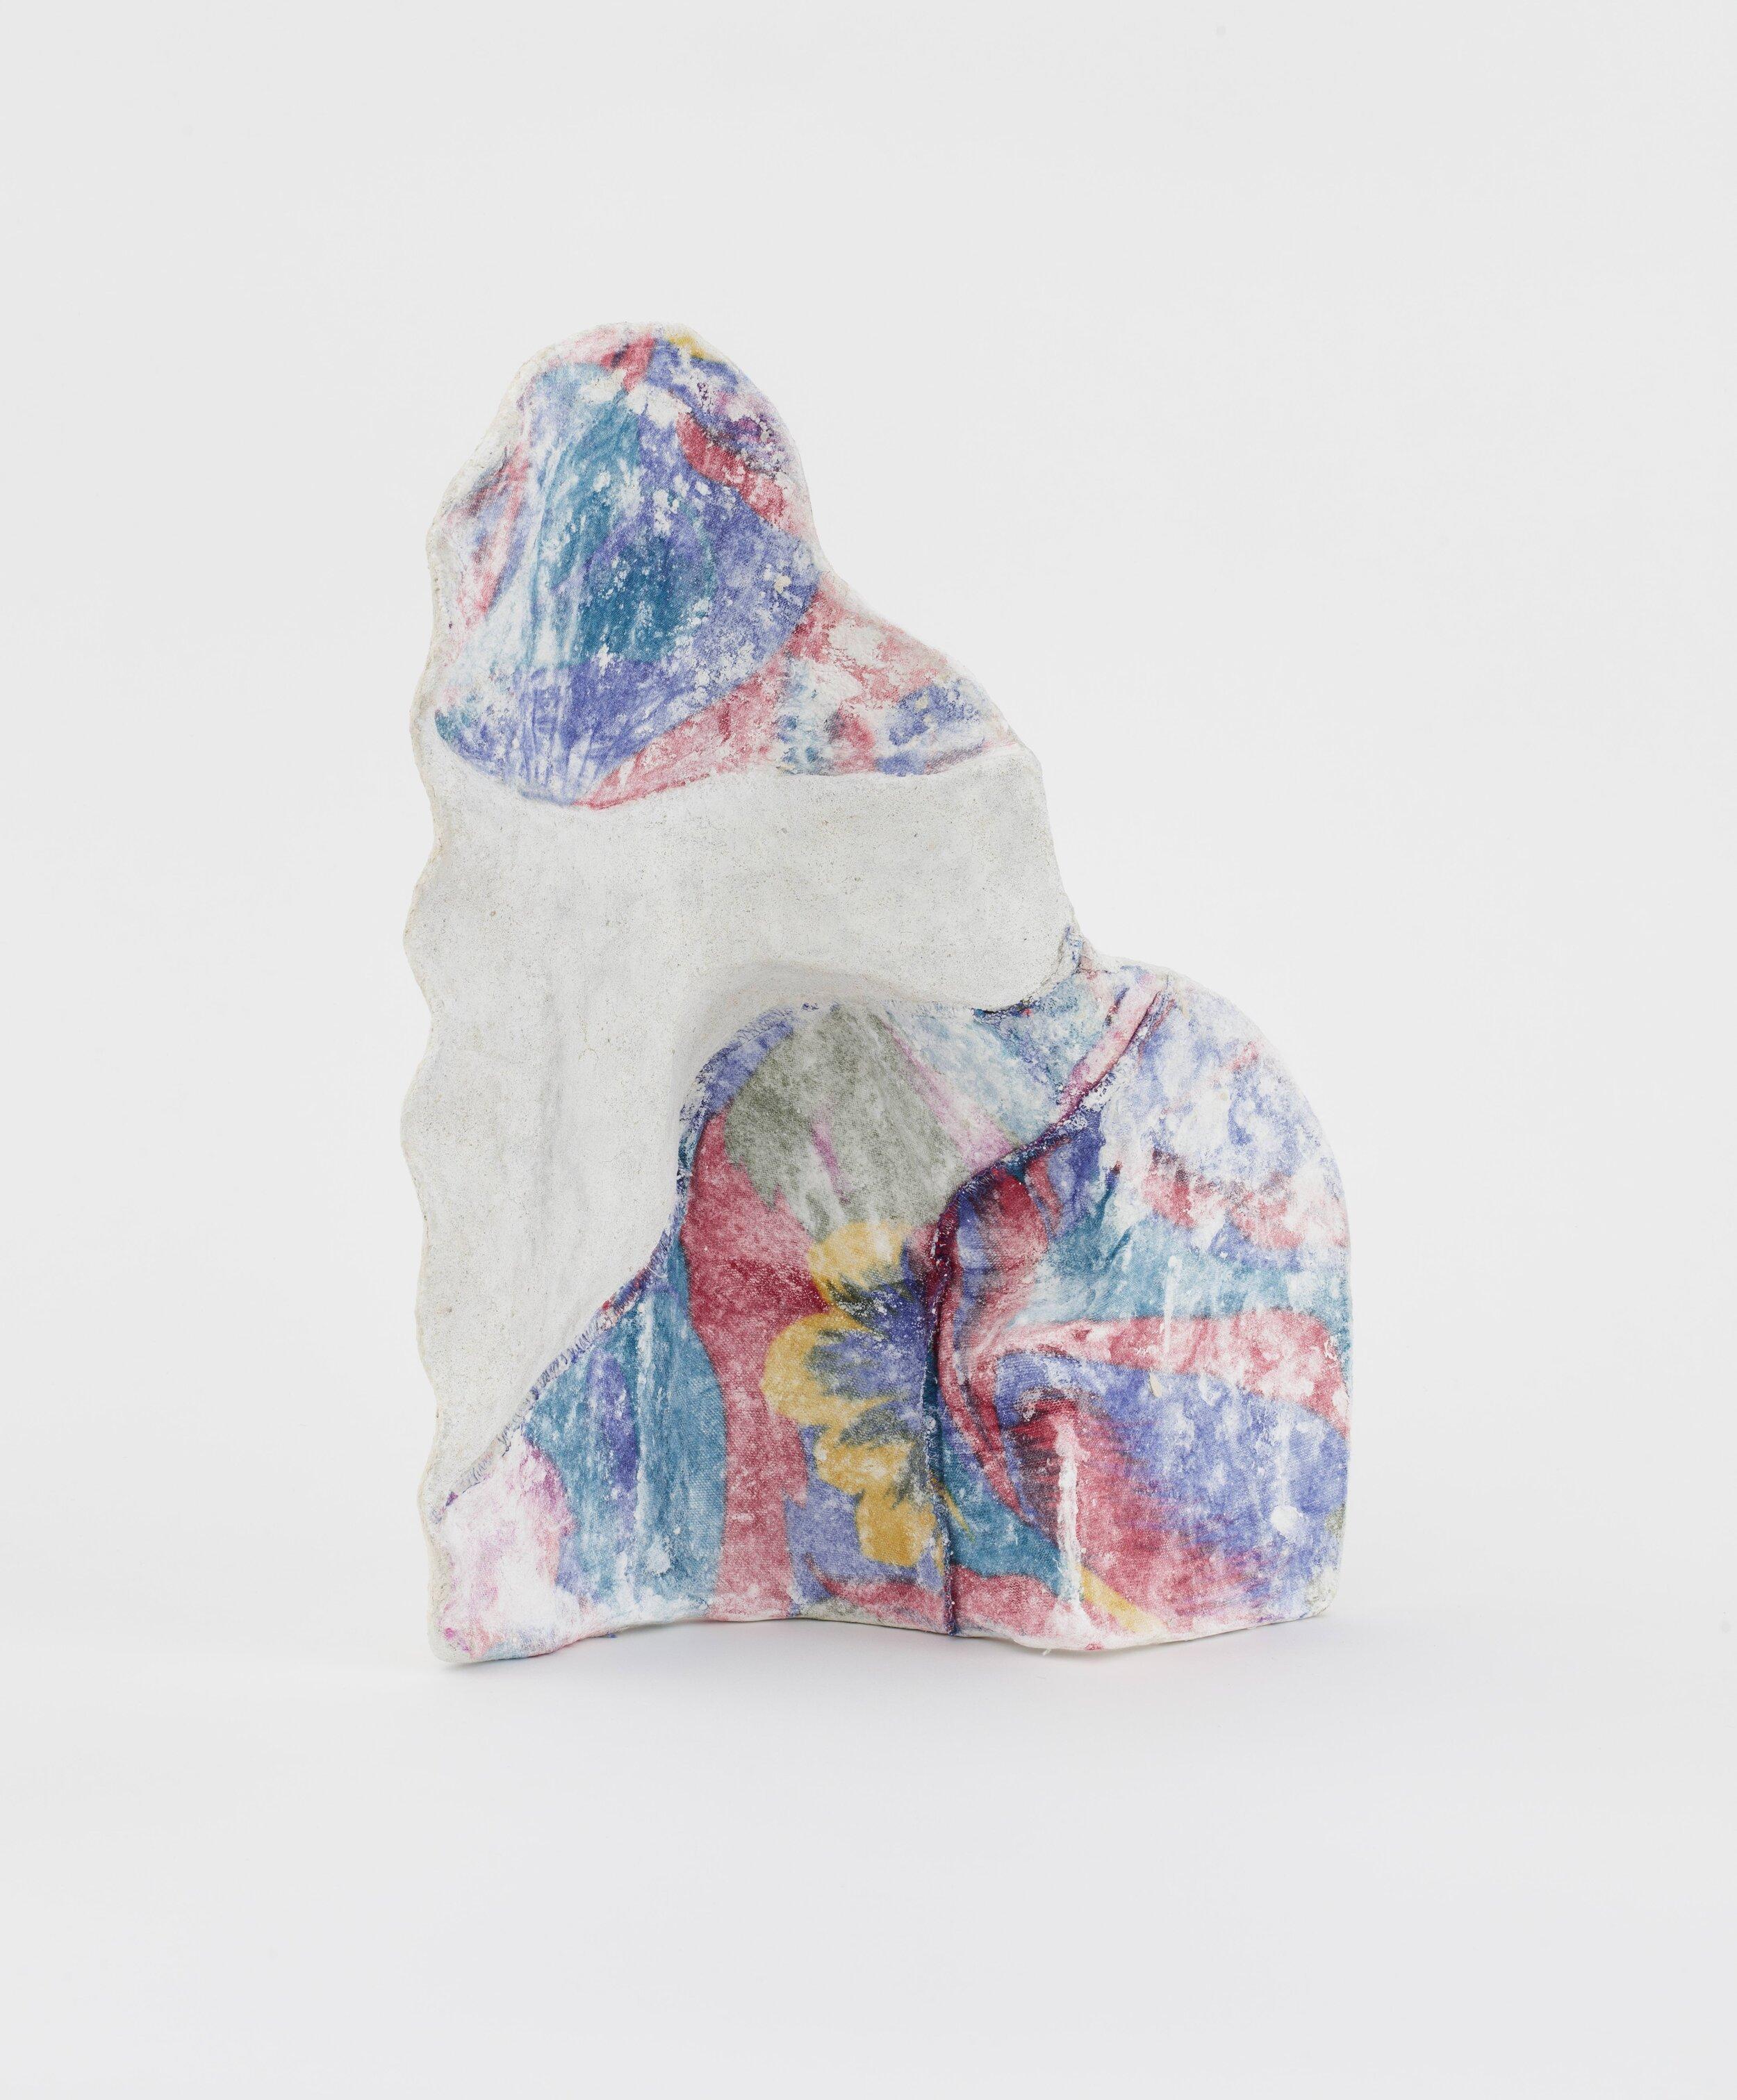 Jennifer Paige Cohen,  Carnation Incantation,  2019. Shirt, plaster, lime plaster, CelluClay. 14.5 x 10.5 x 4.75 inches. 36.8 x 26.7 x 12.1 cm.